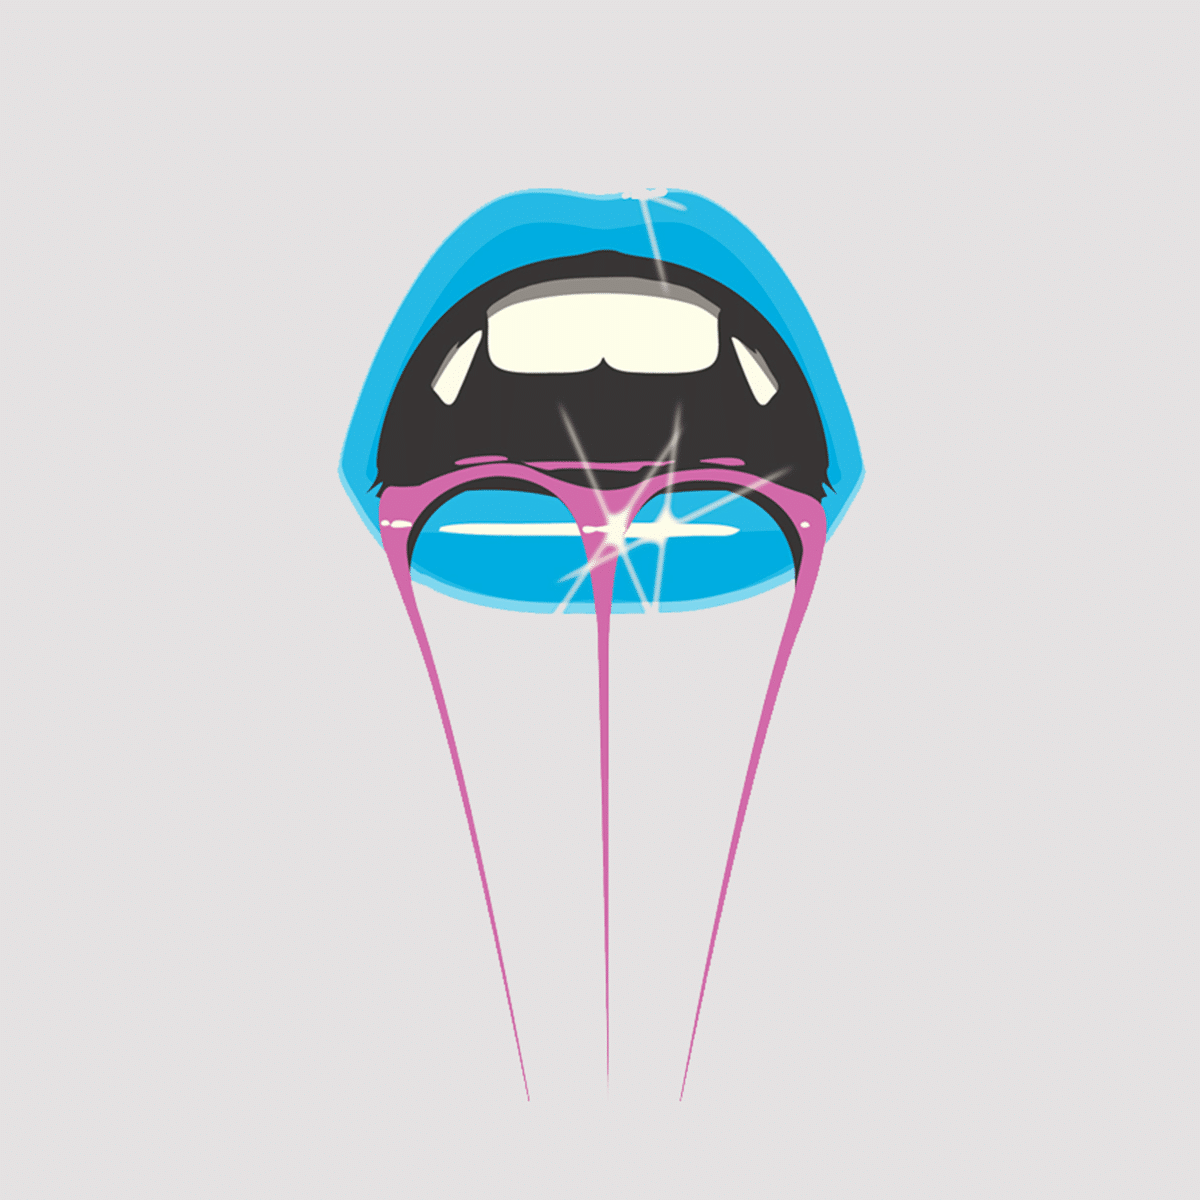 Archive work — Illustration.Mouth.#illustration #mouth #art #artistsoninstagram #artofvisuals #artoftheday #artofinstagram #logo #logos #logodesigner #logodesign #design #designer #designagency #london #dorset #identity #branding #brand #agency #graphicdesign #graphicdesigner #brandingagency .@designspiration #designinspiration